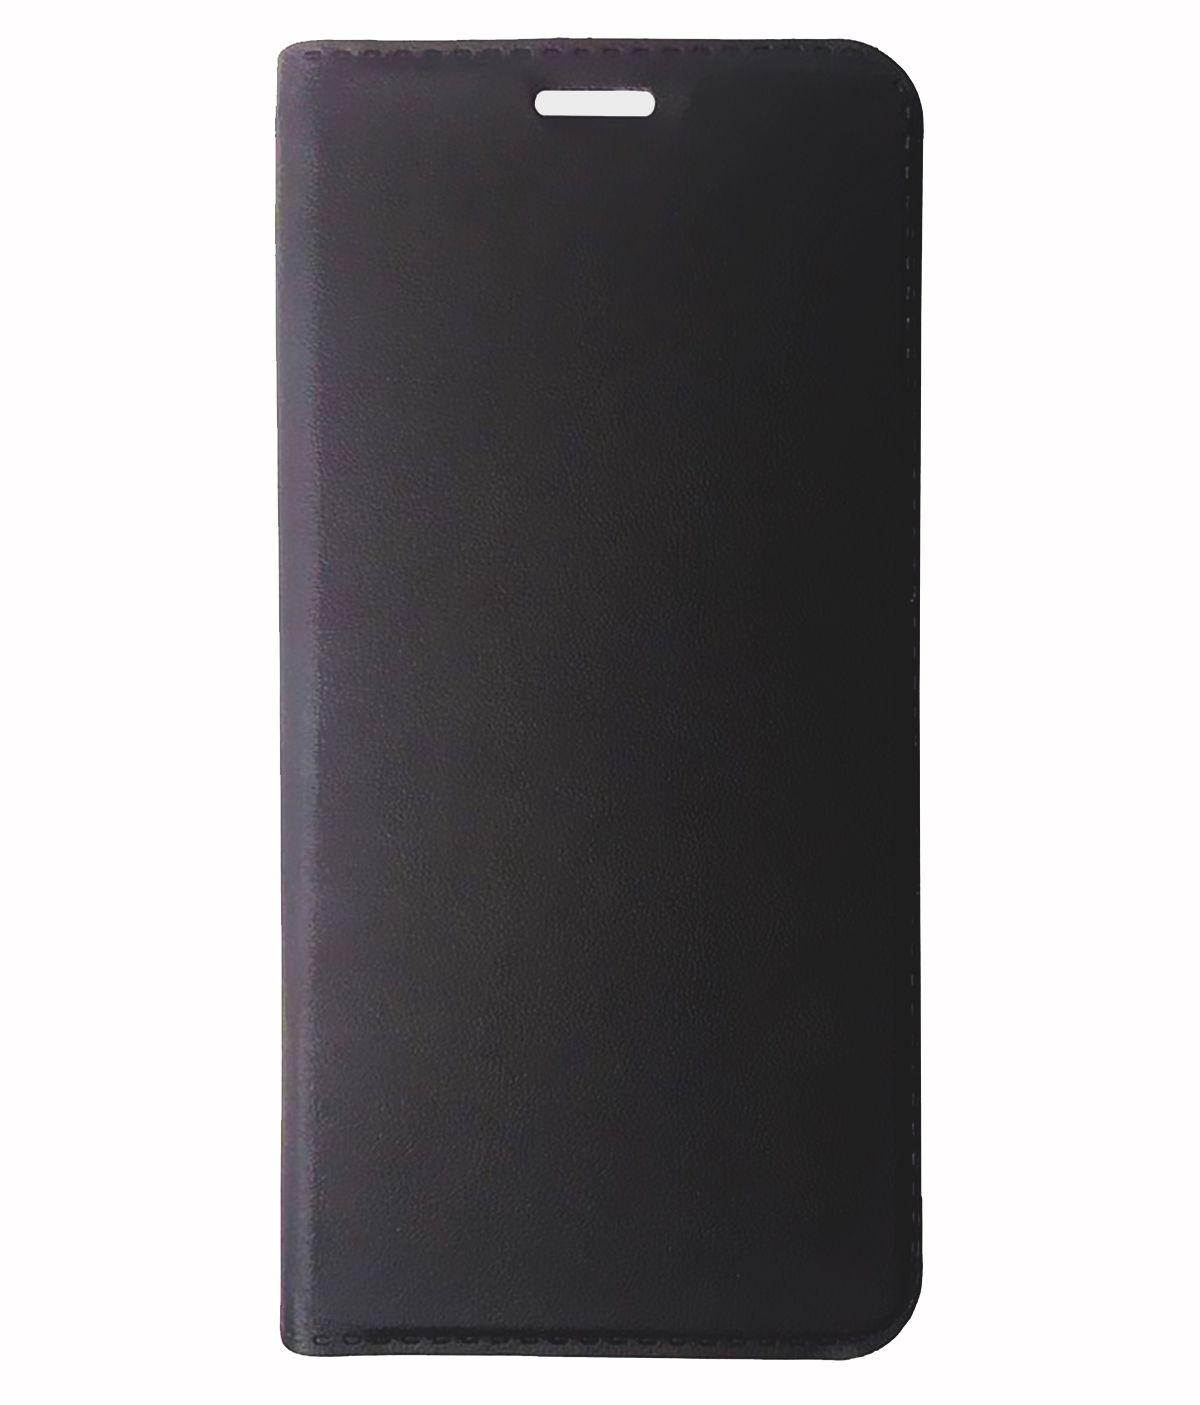 watch cbcaf 91c4b Samsung Galaxy J1 Mini Flip Cover by WIITTYOWL - Black